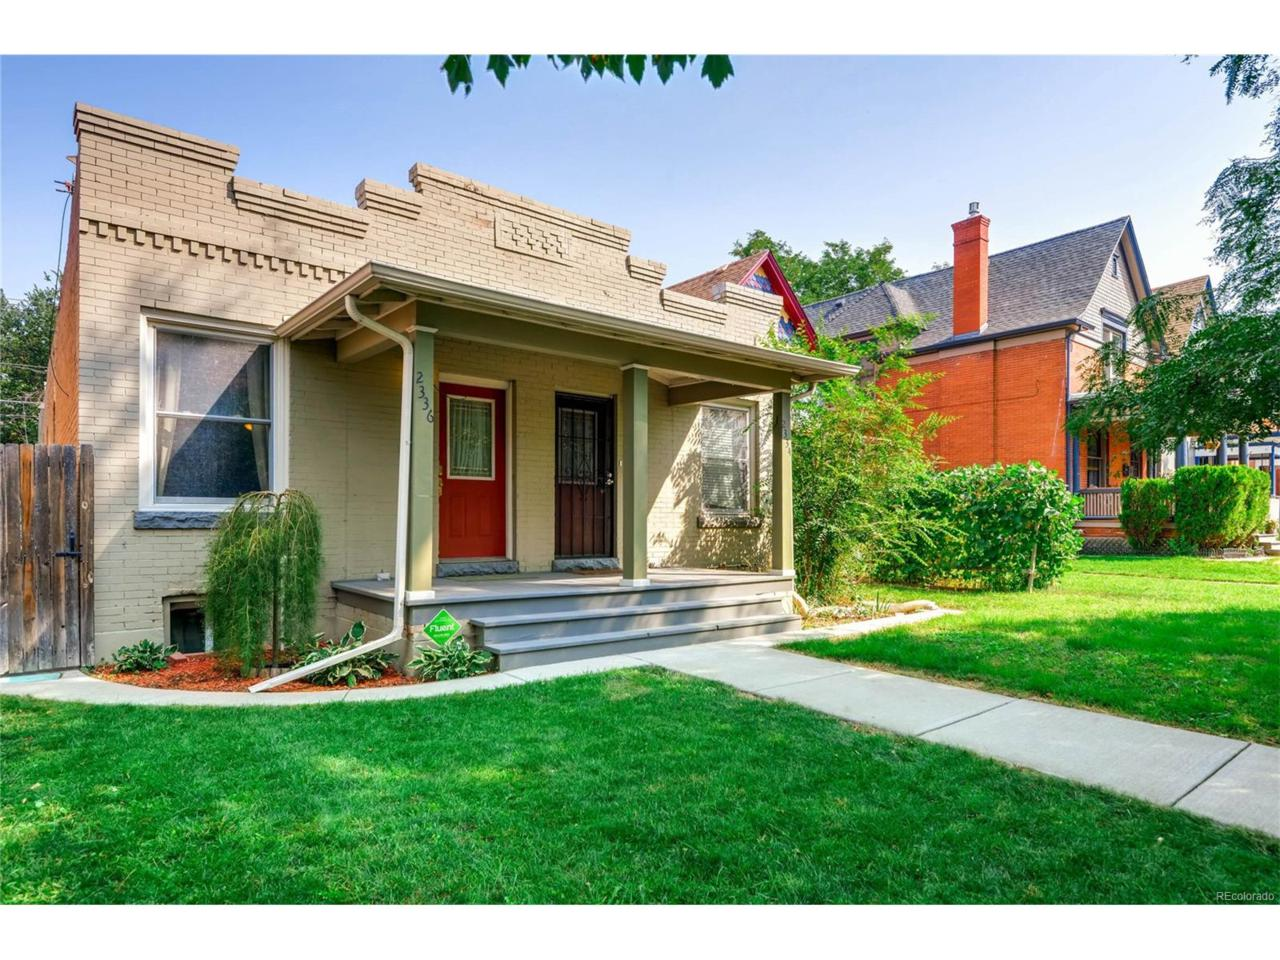 2336 N Williams Street, Denver, CO 80205 (MLS #8828494) :: 8z Real Estate